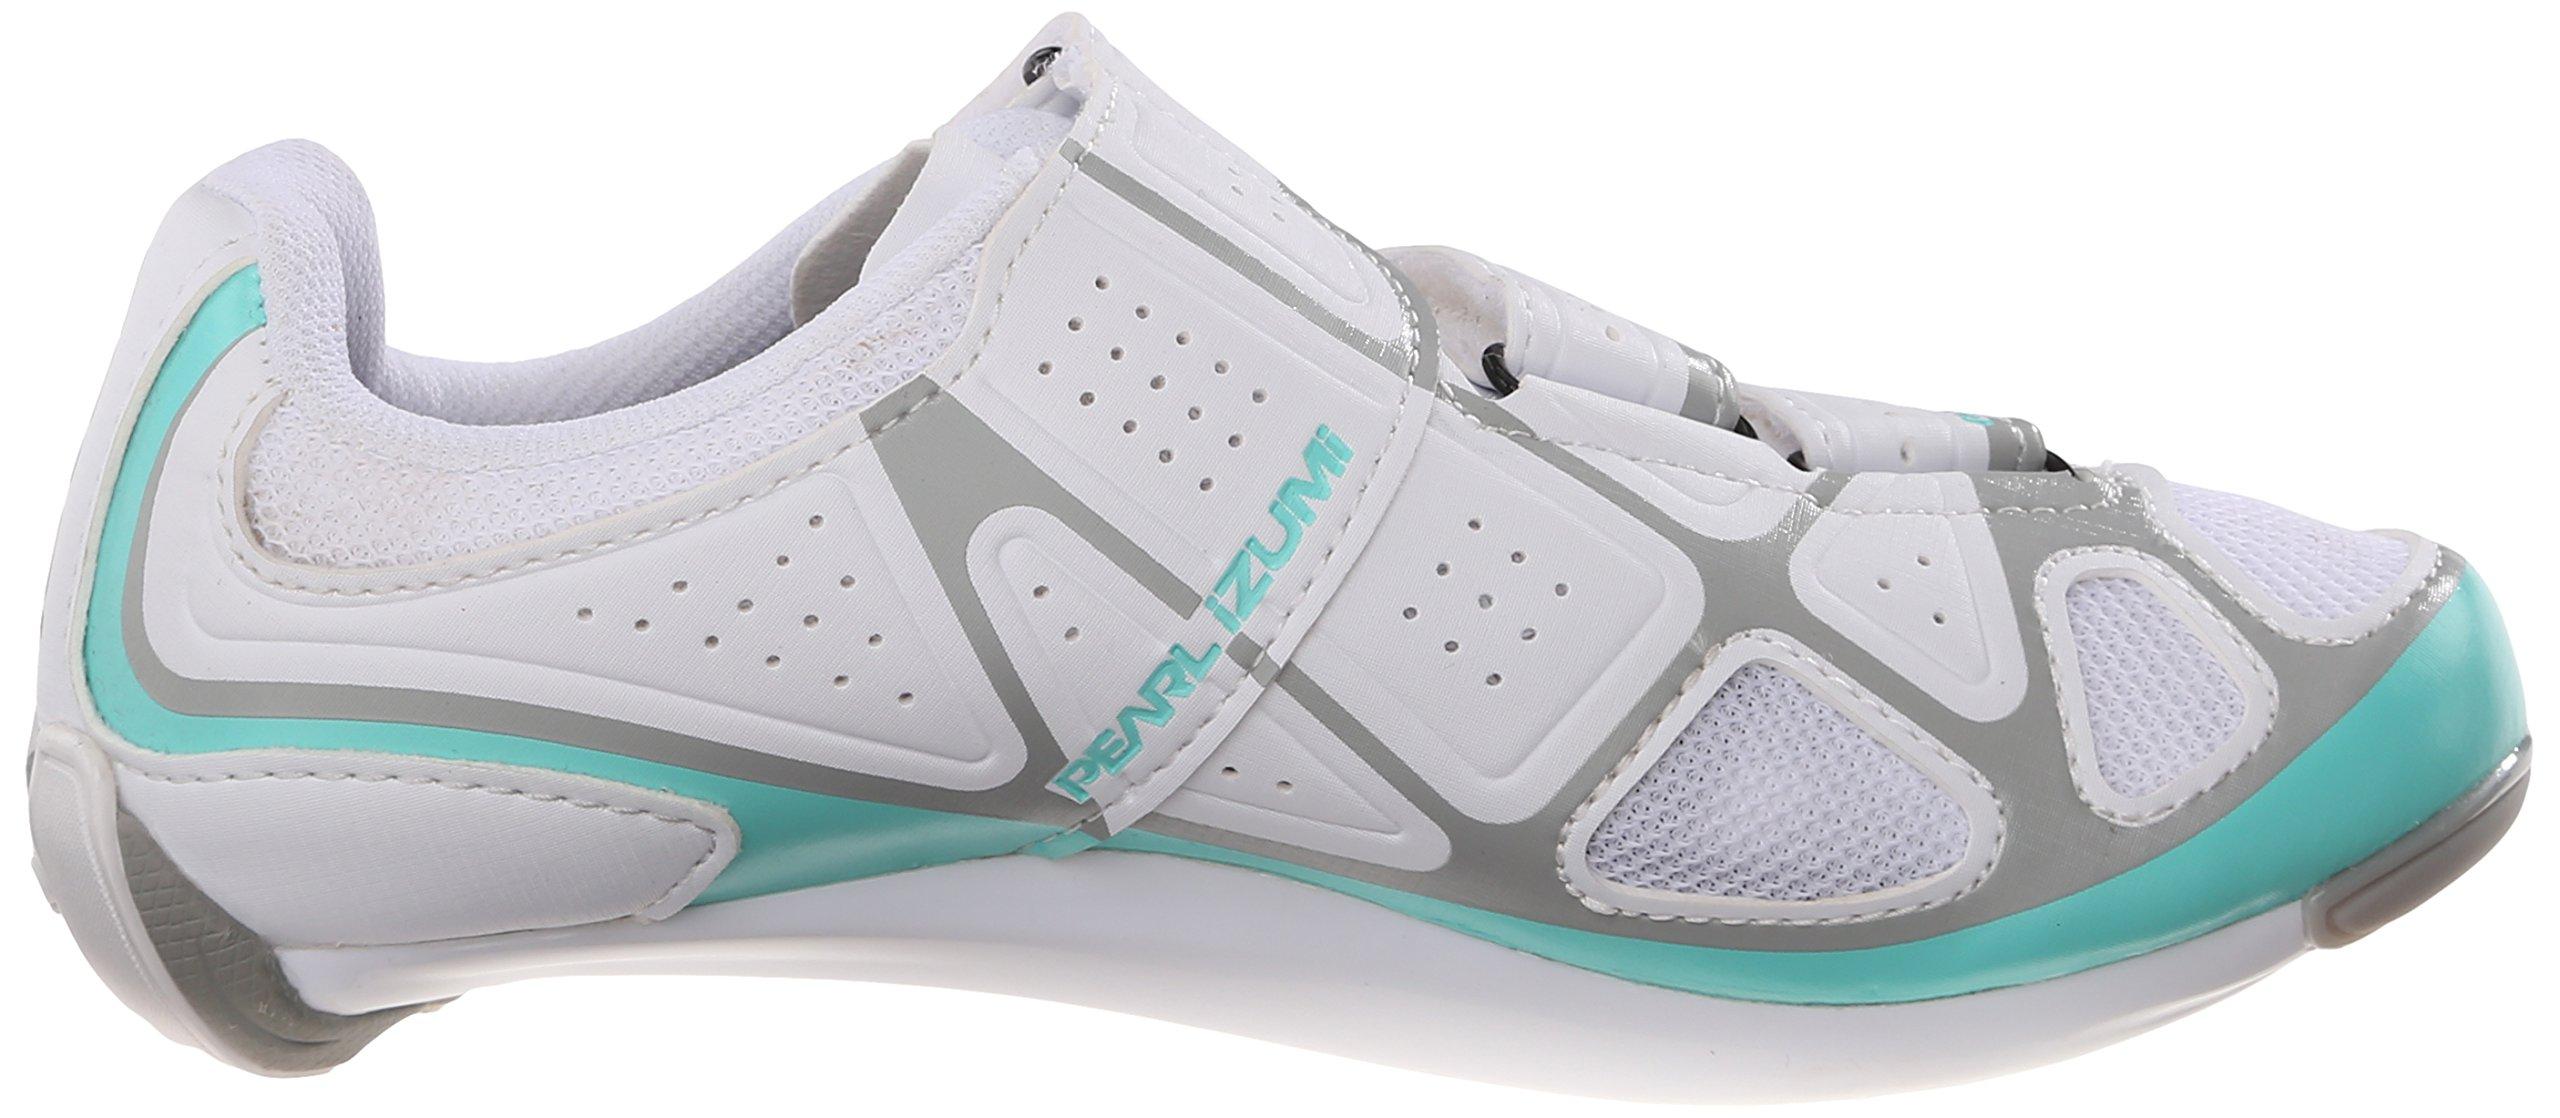 Pearl Izumi Women's W Select RD IV Cycling Shoe, White/Aqua Mint, 40 EU/8.3 B US by Pearl iZUMi (Image #7)